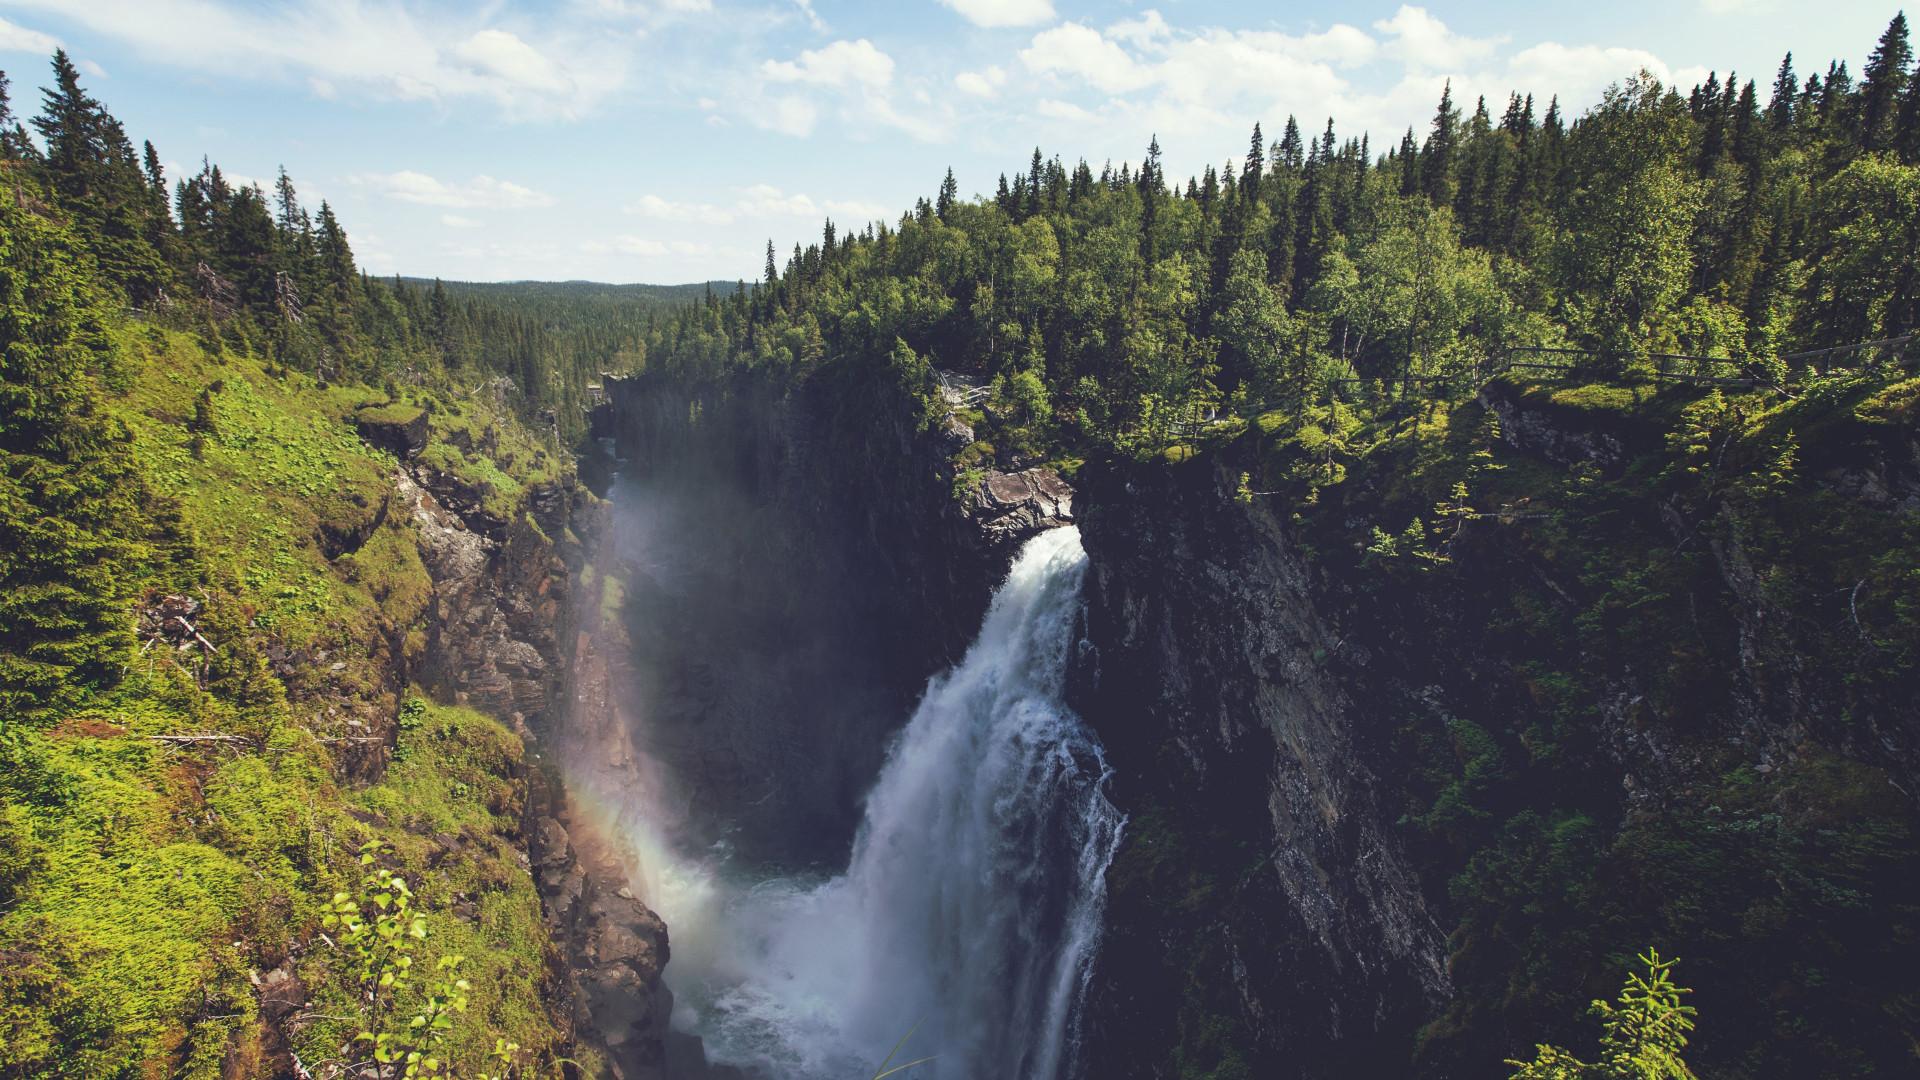 Download Wallpaper Super Waterfall 1920x1080